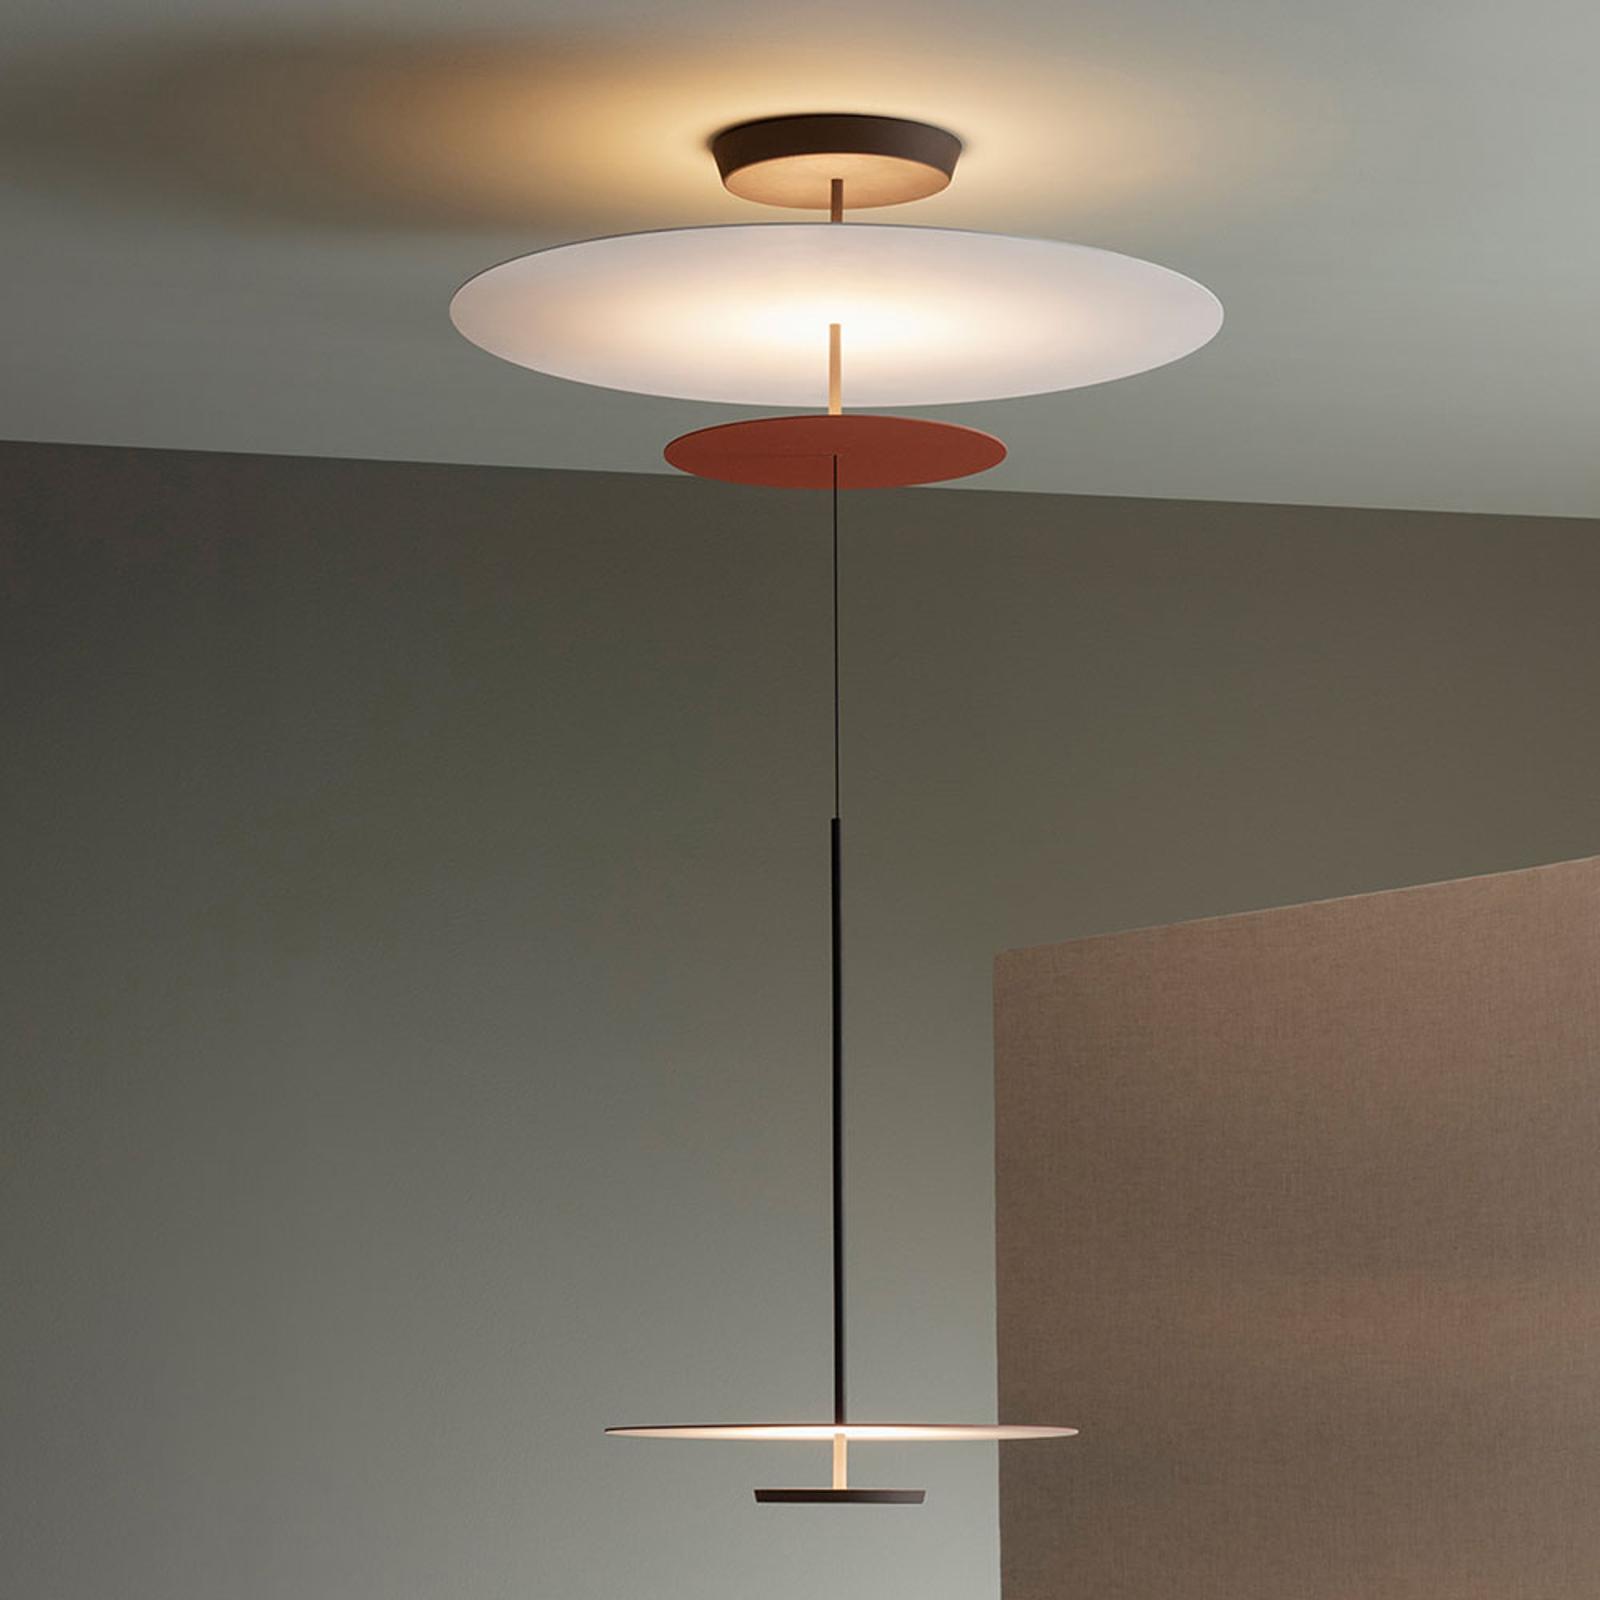 Vibia Flat LED-hængelampe 3 lk. Ø 90 cm terrakotta